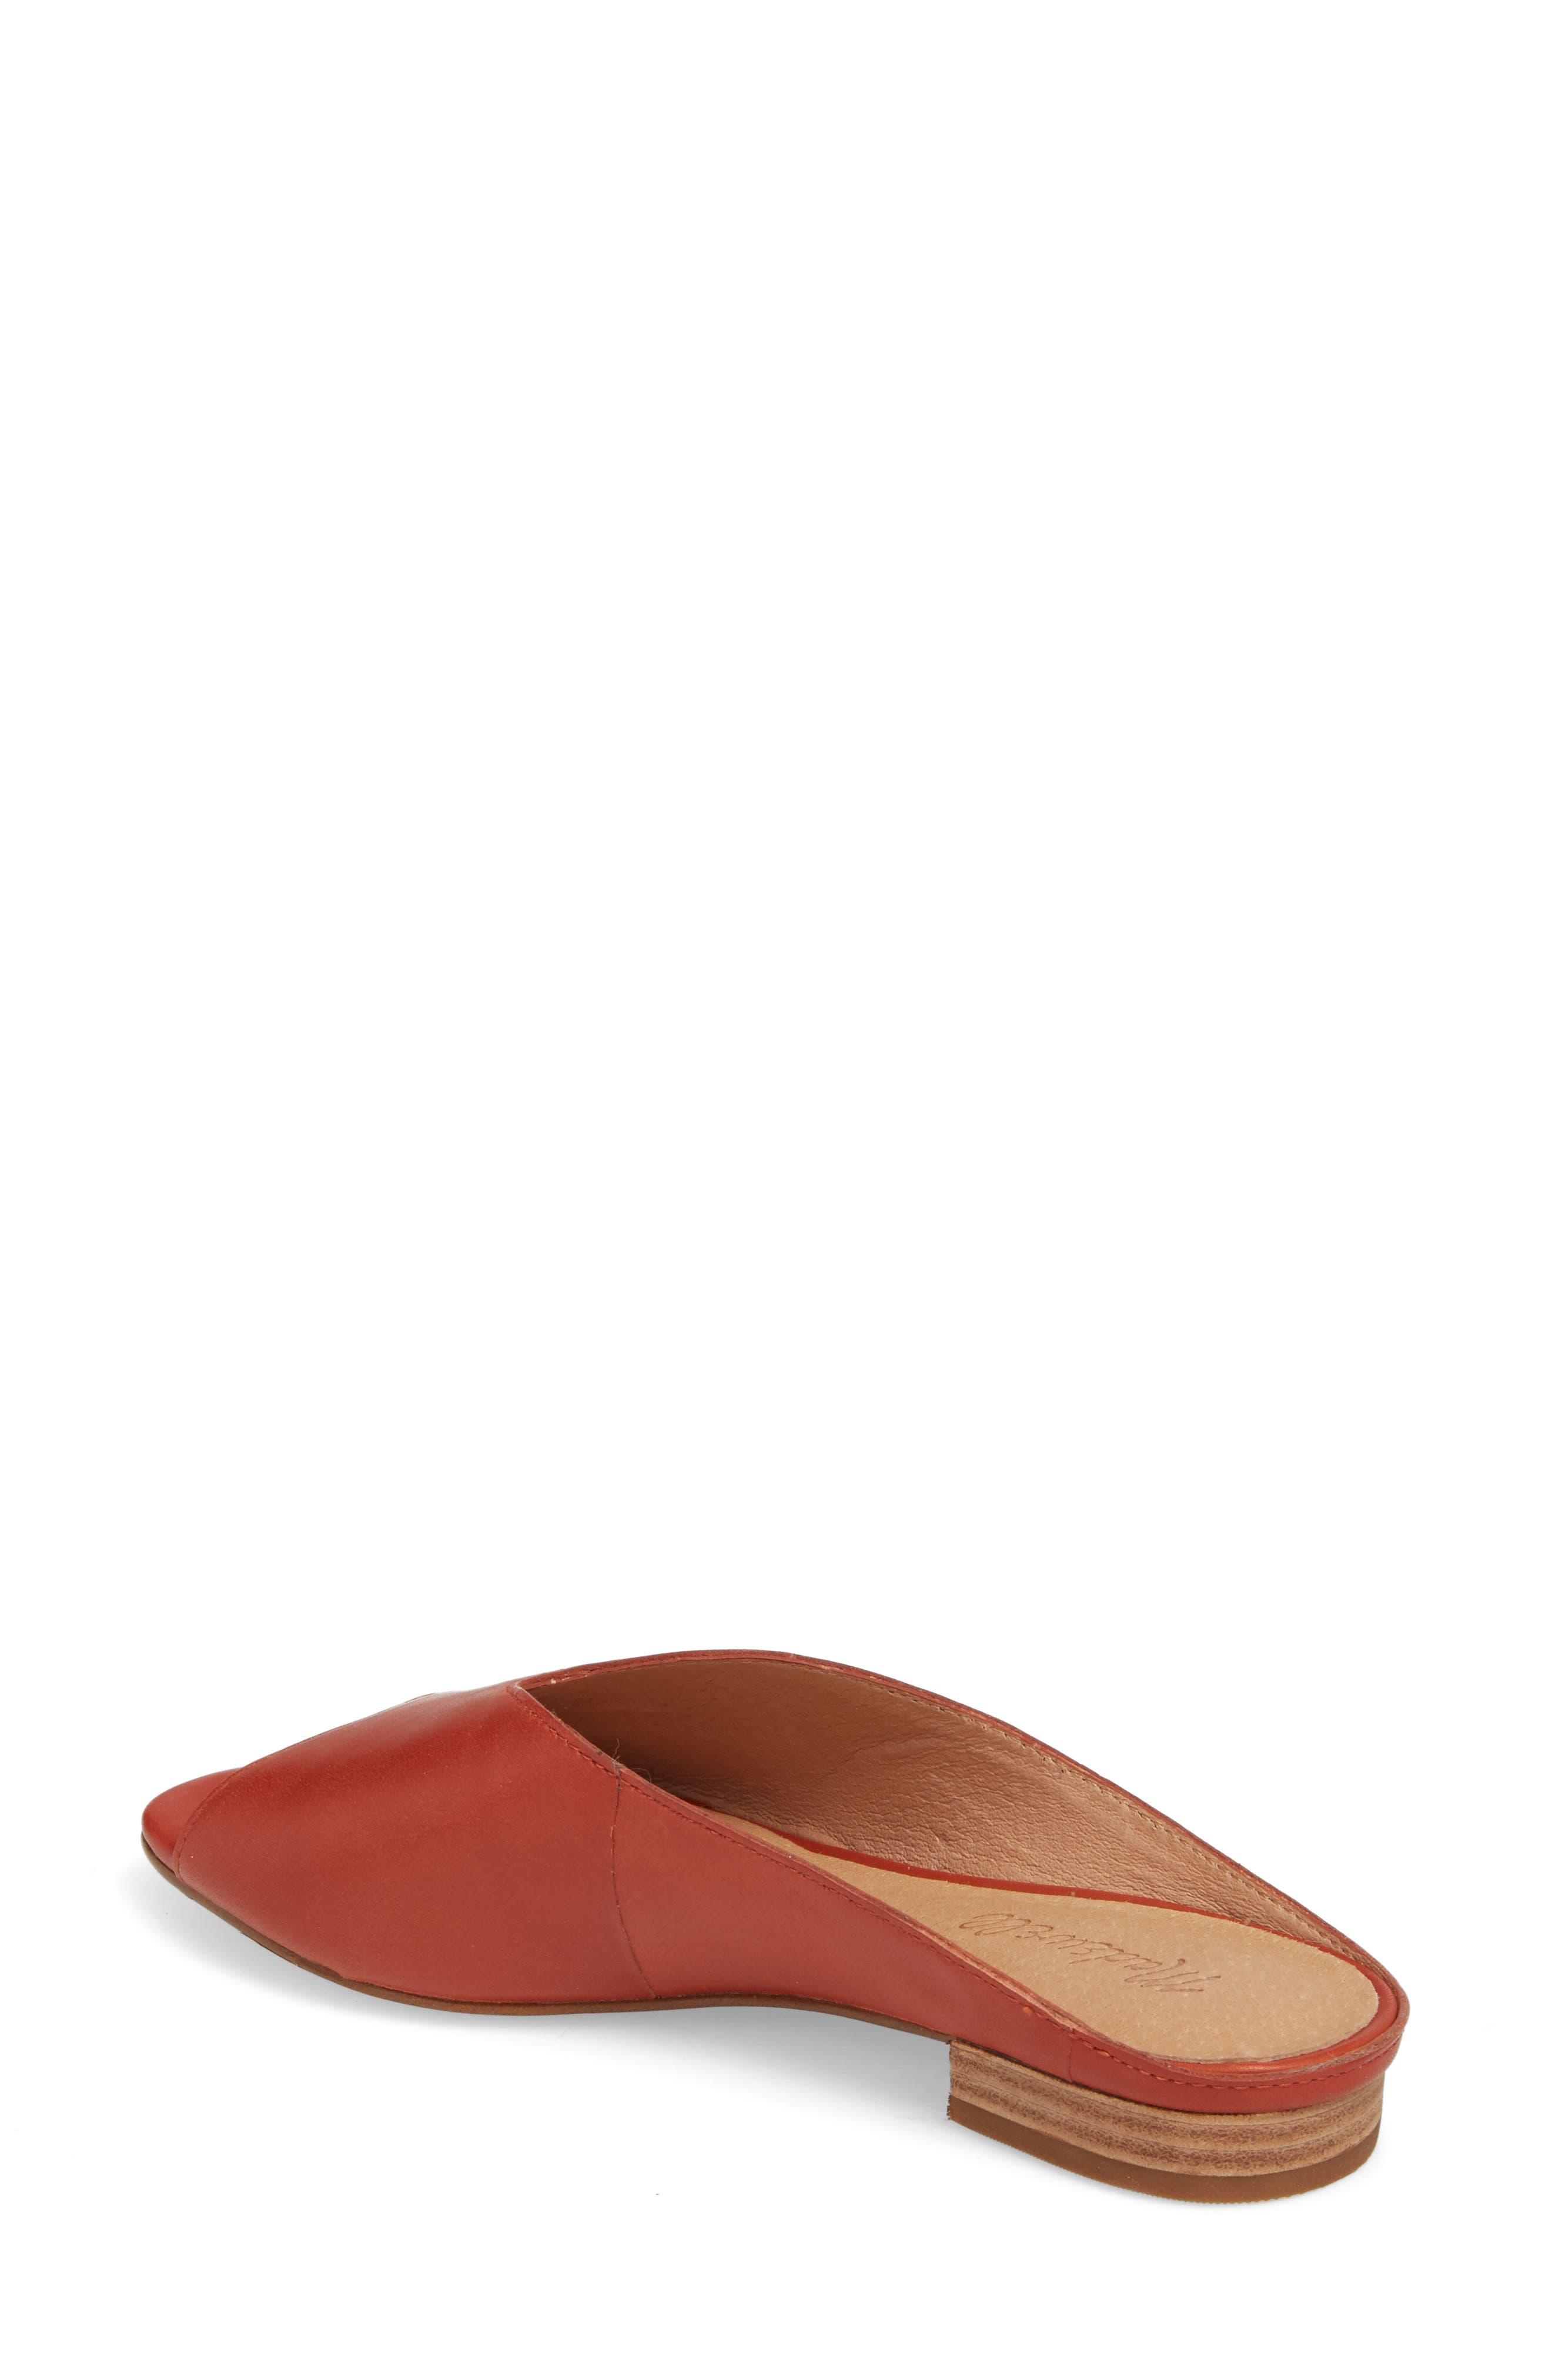 Tavi Slide Sandal,                             Alternate thumbnail 2, color,                             Dark Cinnabar Leather